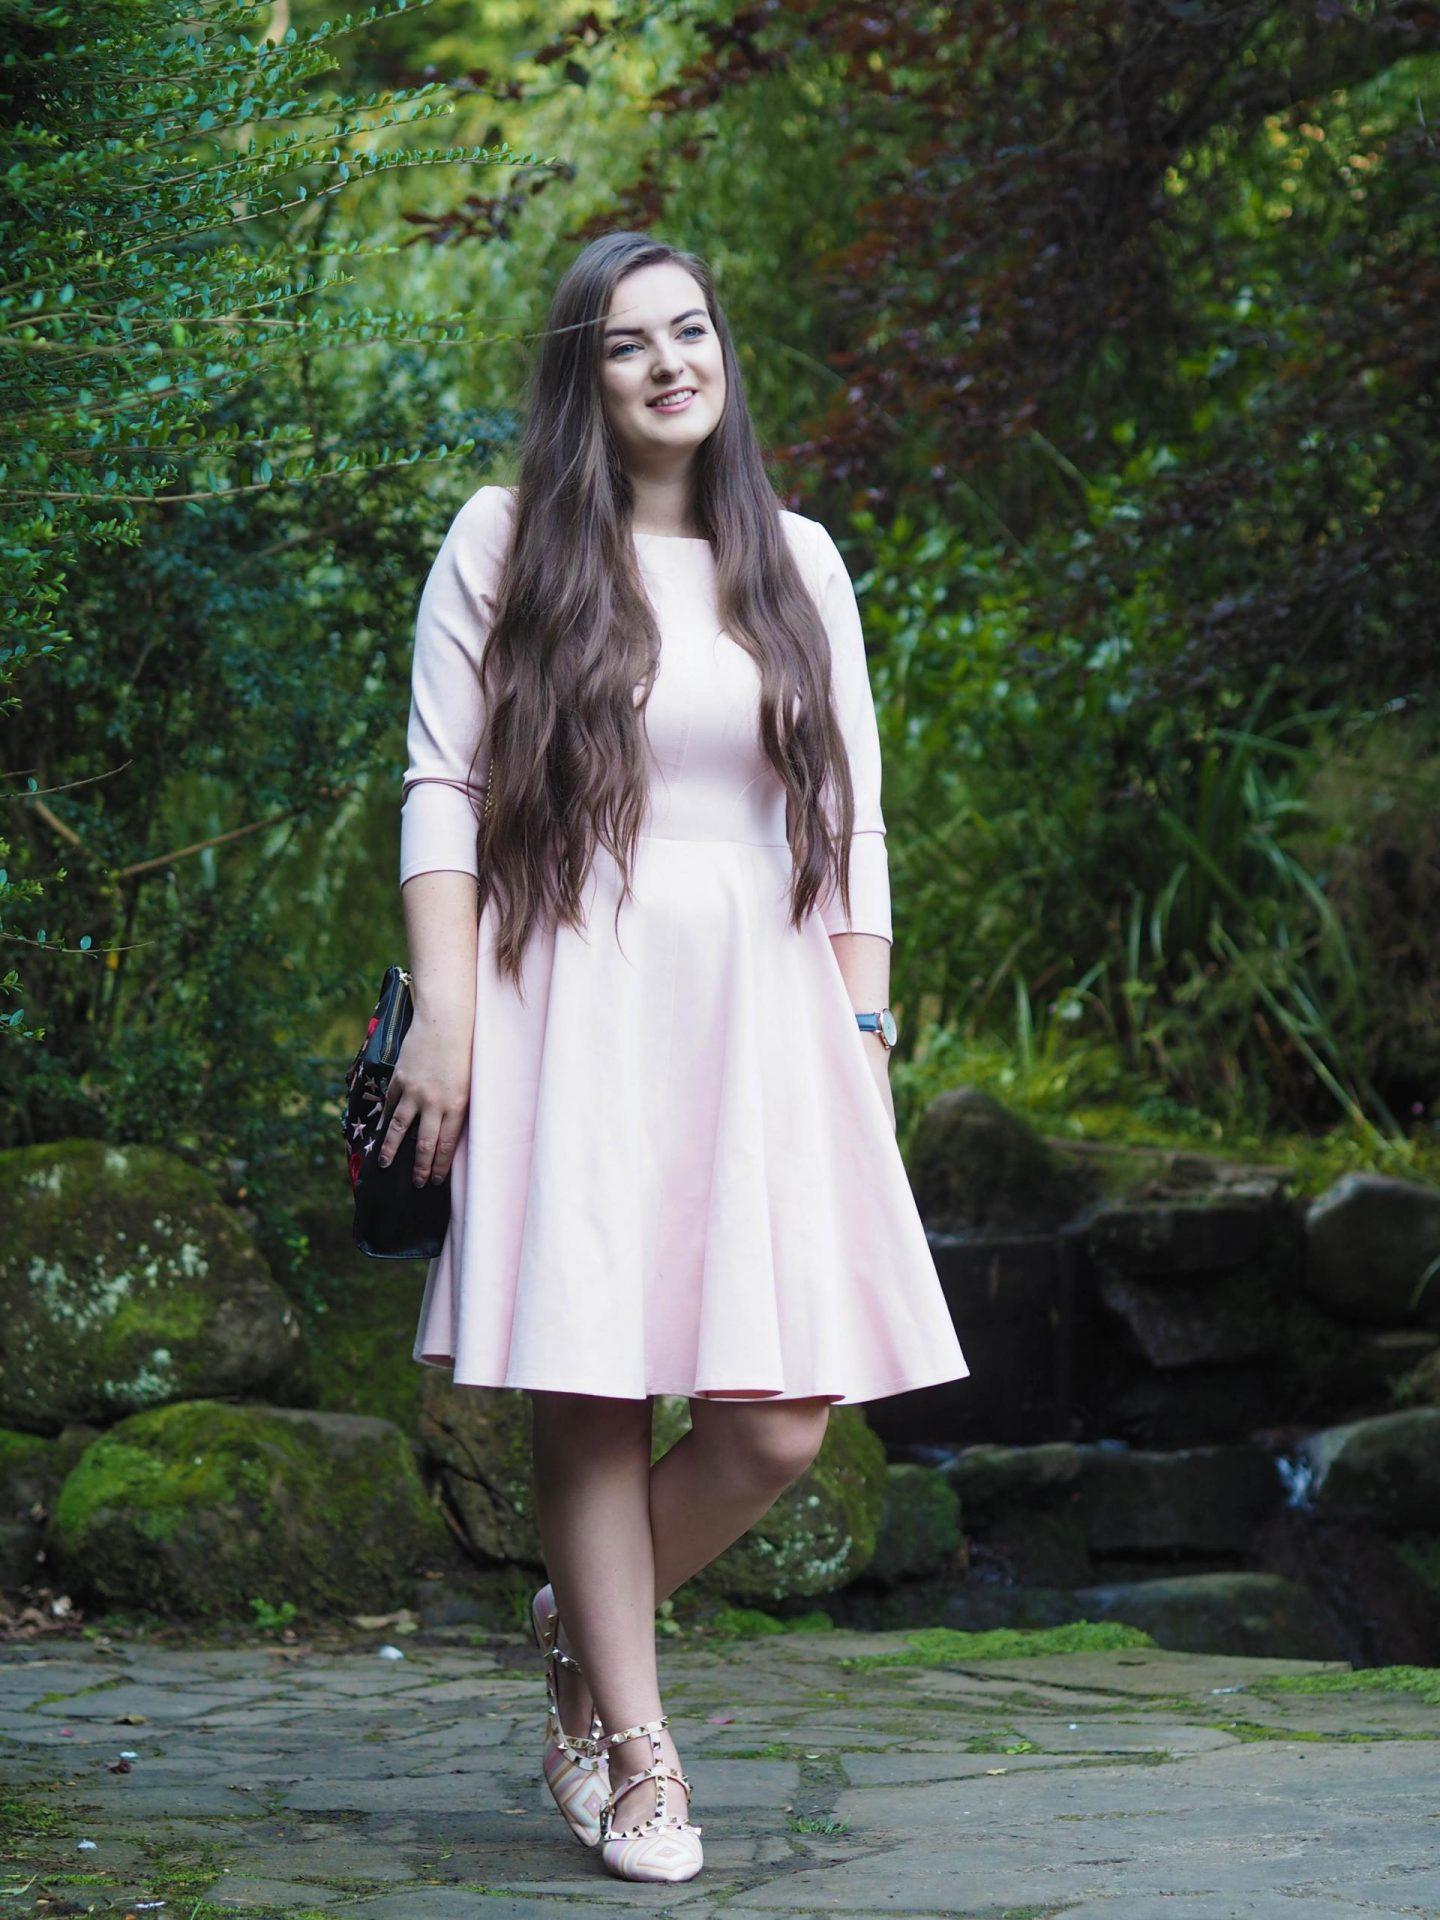 Closet London Pink Princess Dress - Rachel Nicole UK Fashion Blogger